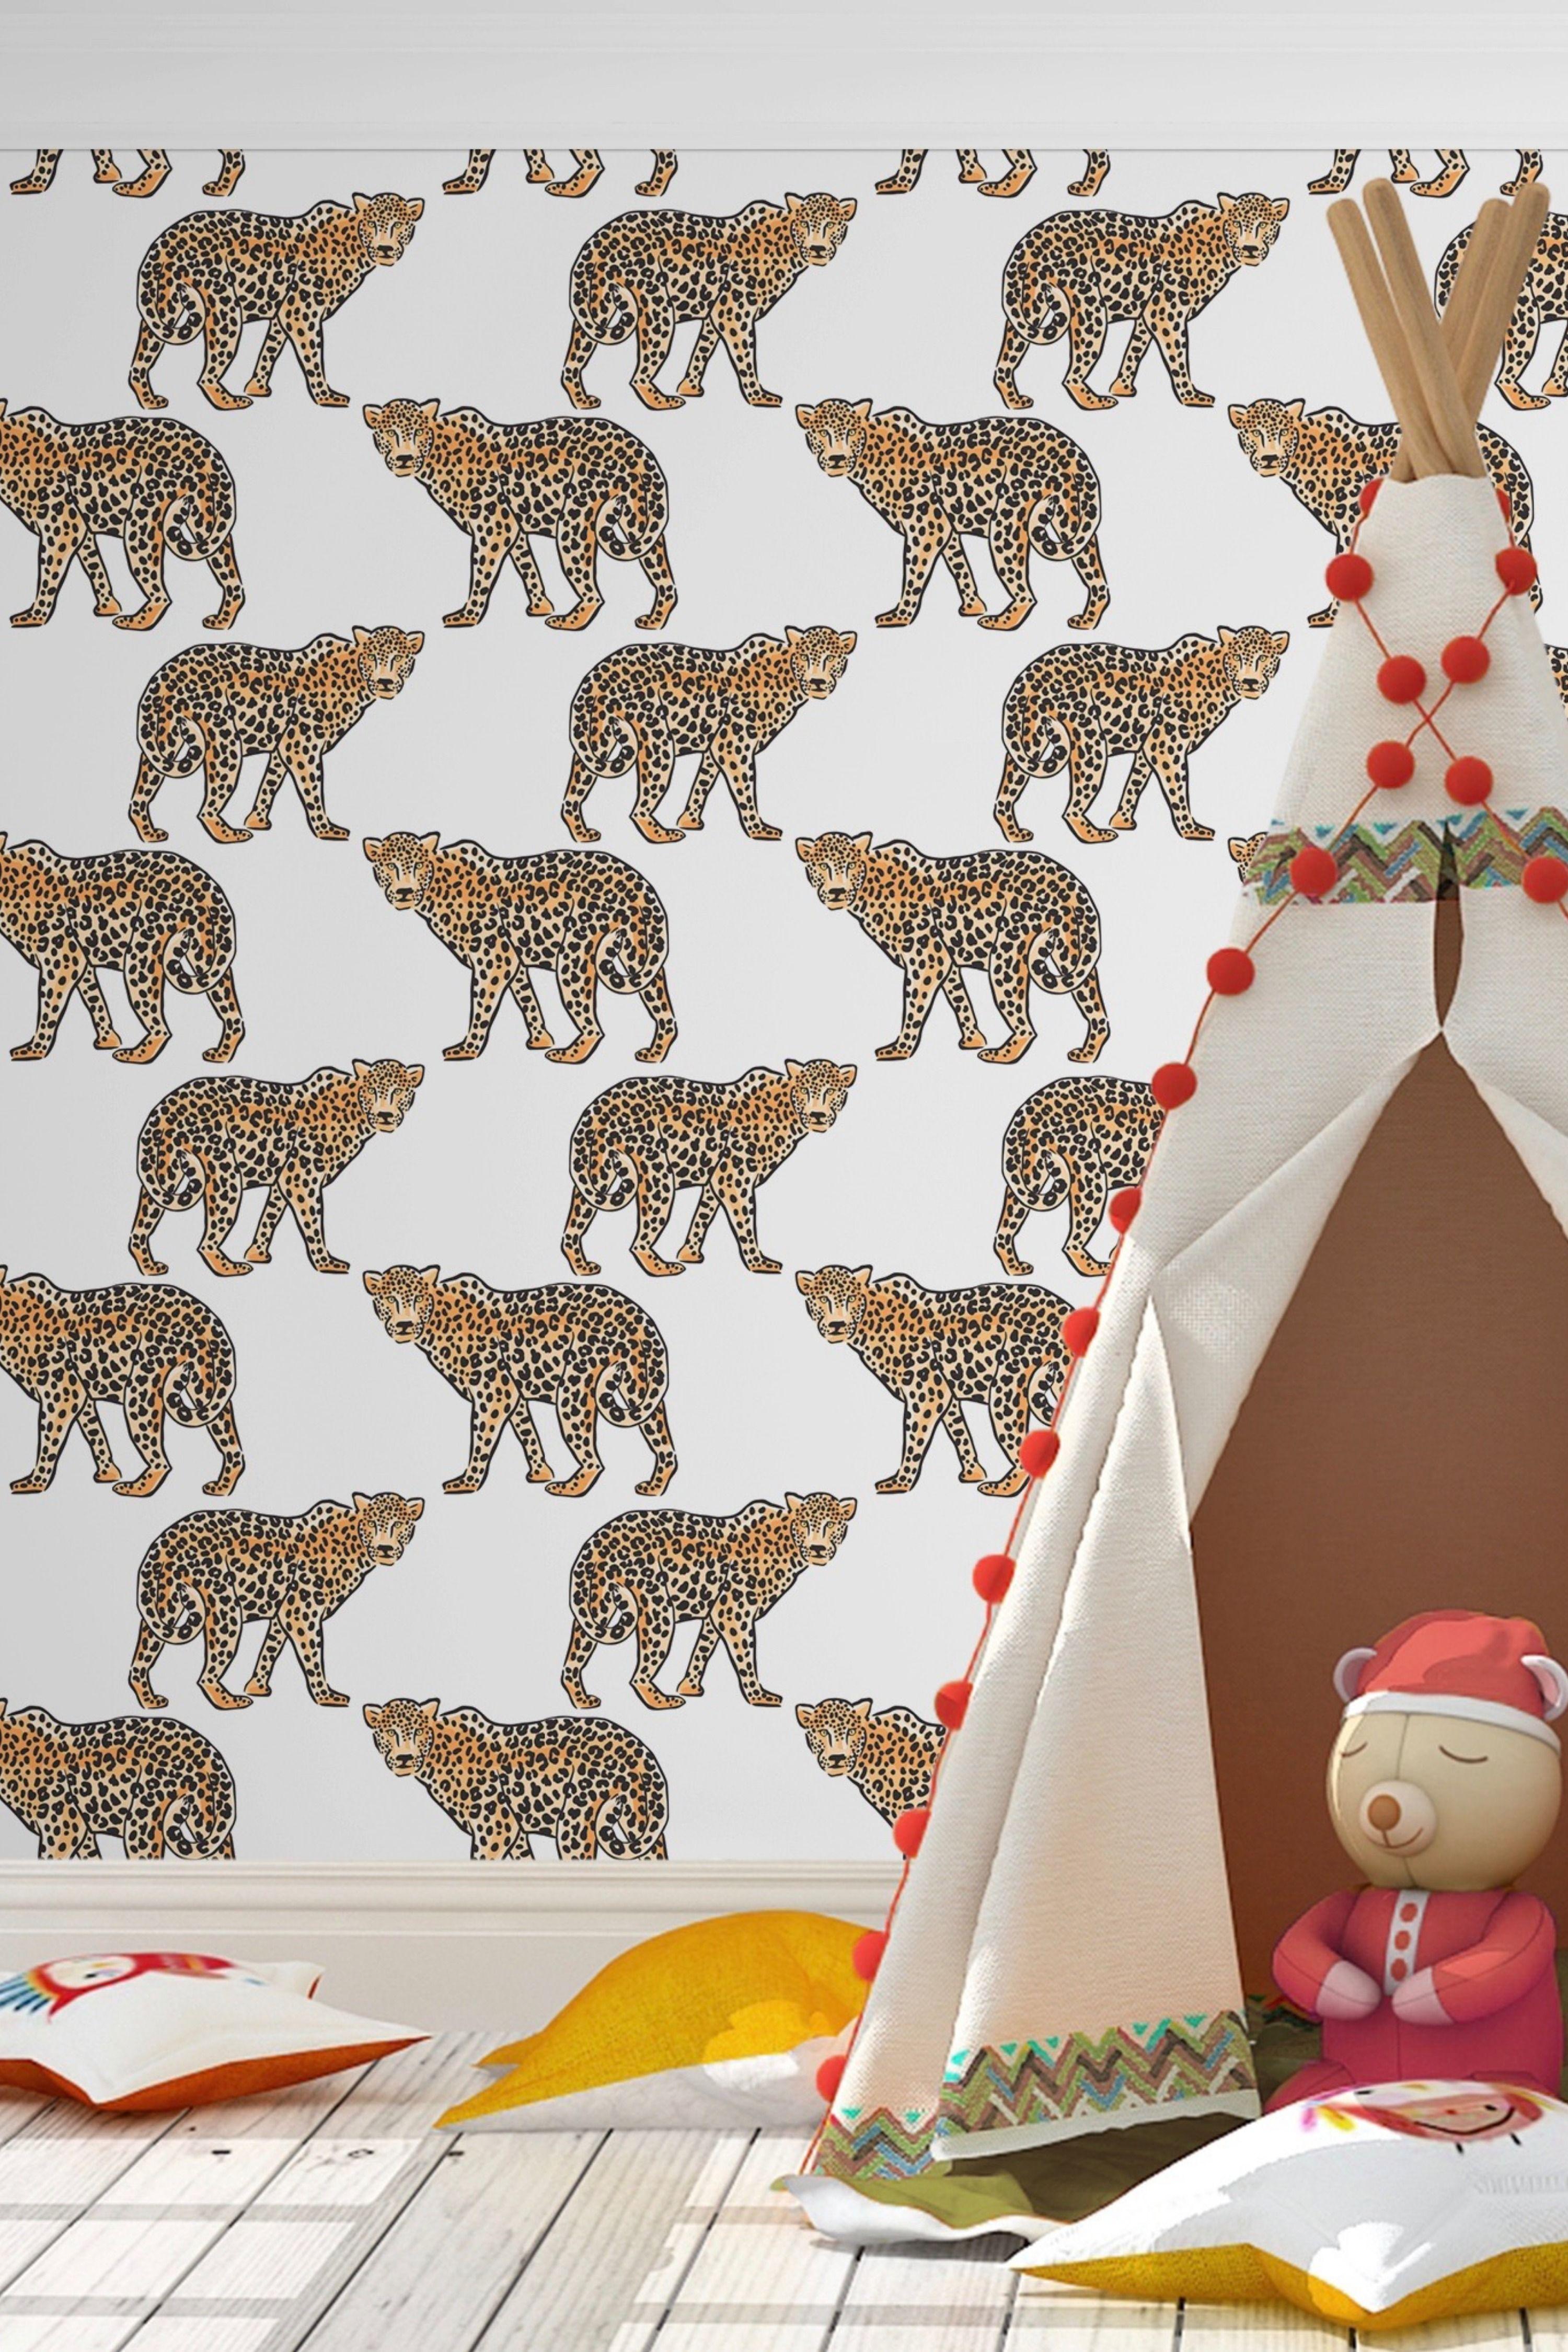 Leopard Print Peel And Stick Wallpaper Peel And Stick Wallpaper Leopard Print Wallpaper Print Wallpaper